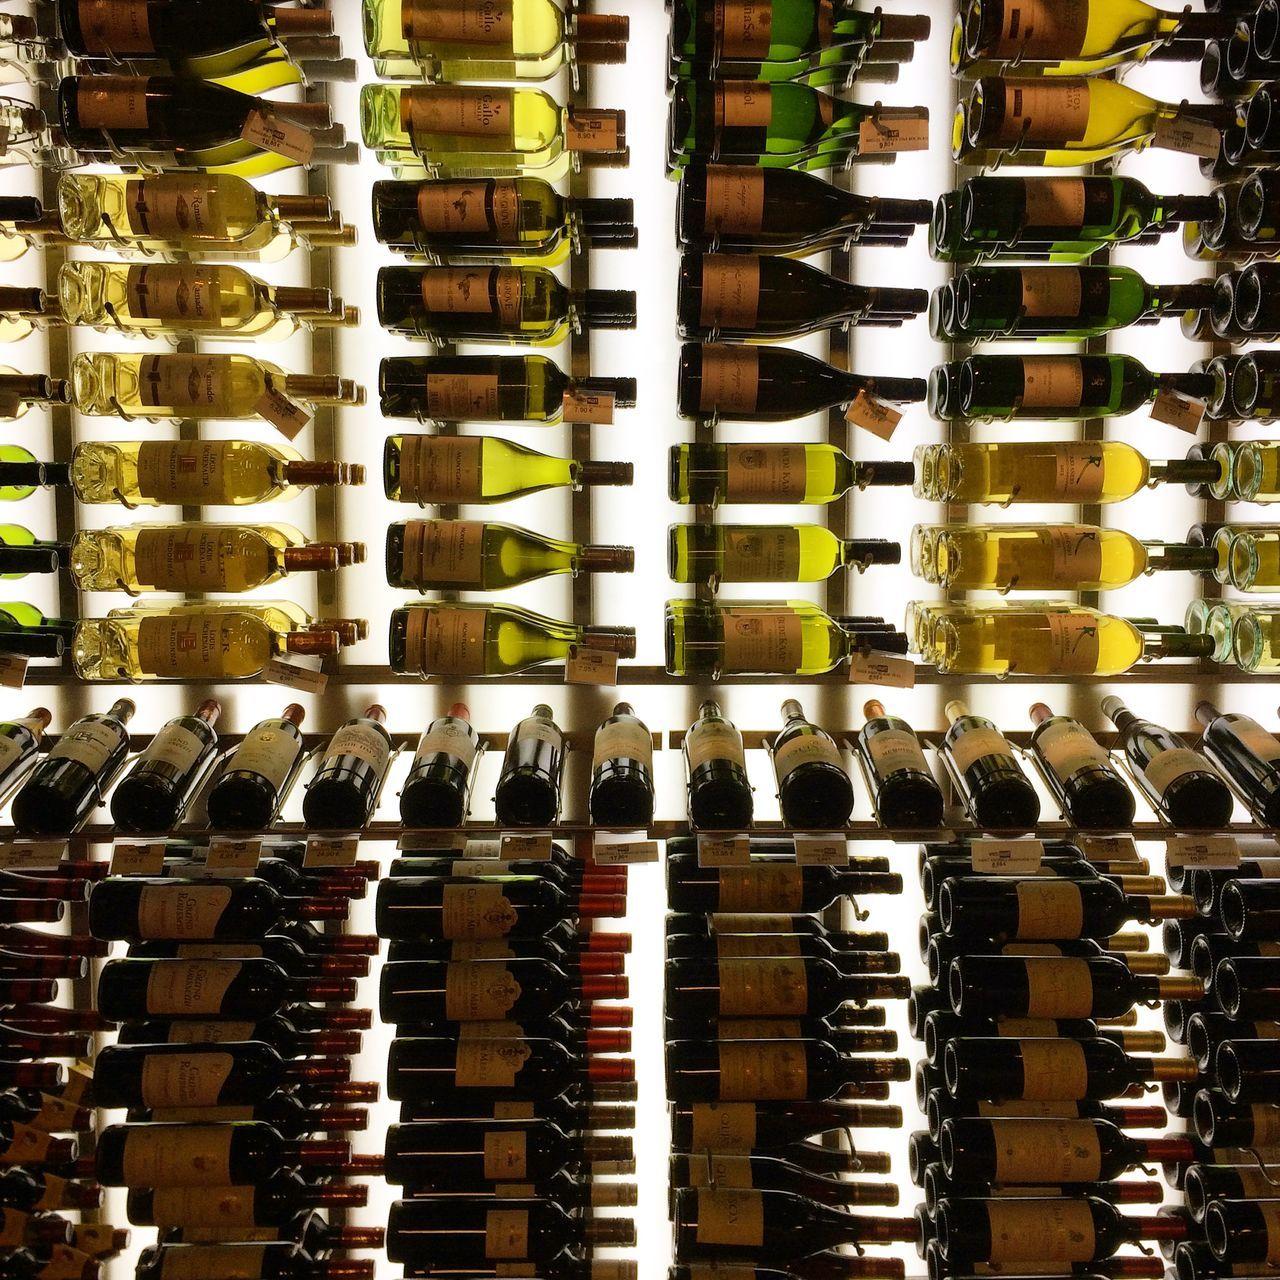 Beautiful stock photos of wine, Abundance, Arrangement, Backgrounds, Bar - Drink Establishment